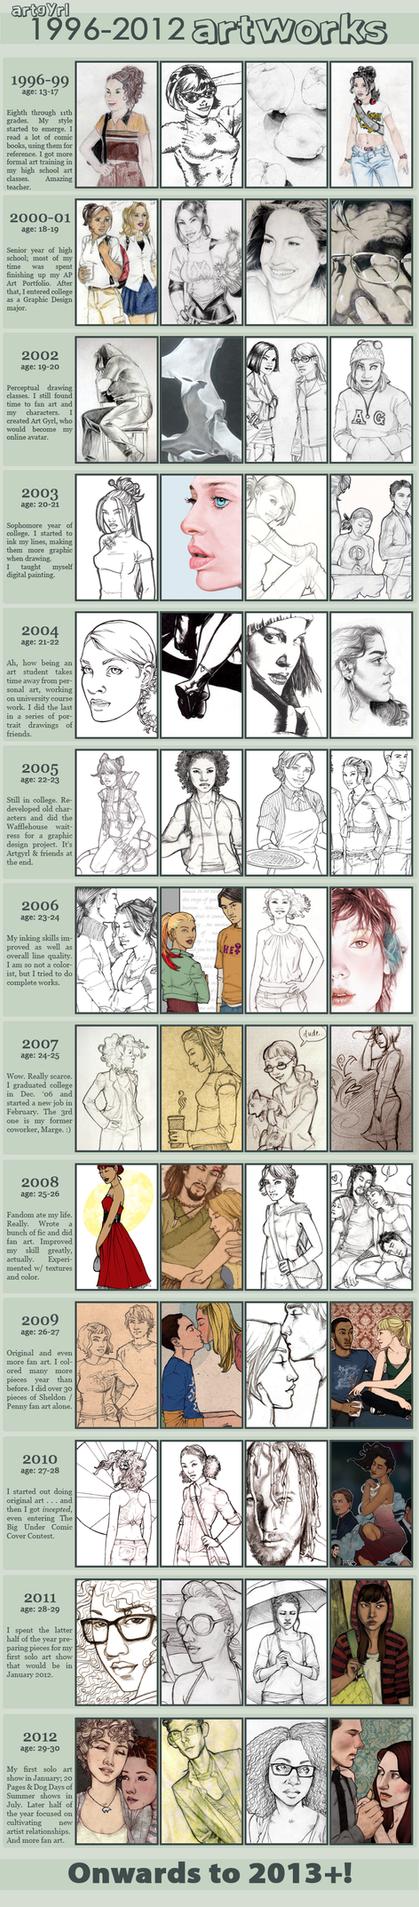 1996-2012 ART IMPROVEMENT MEME by artgyrl